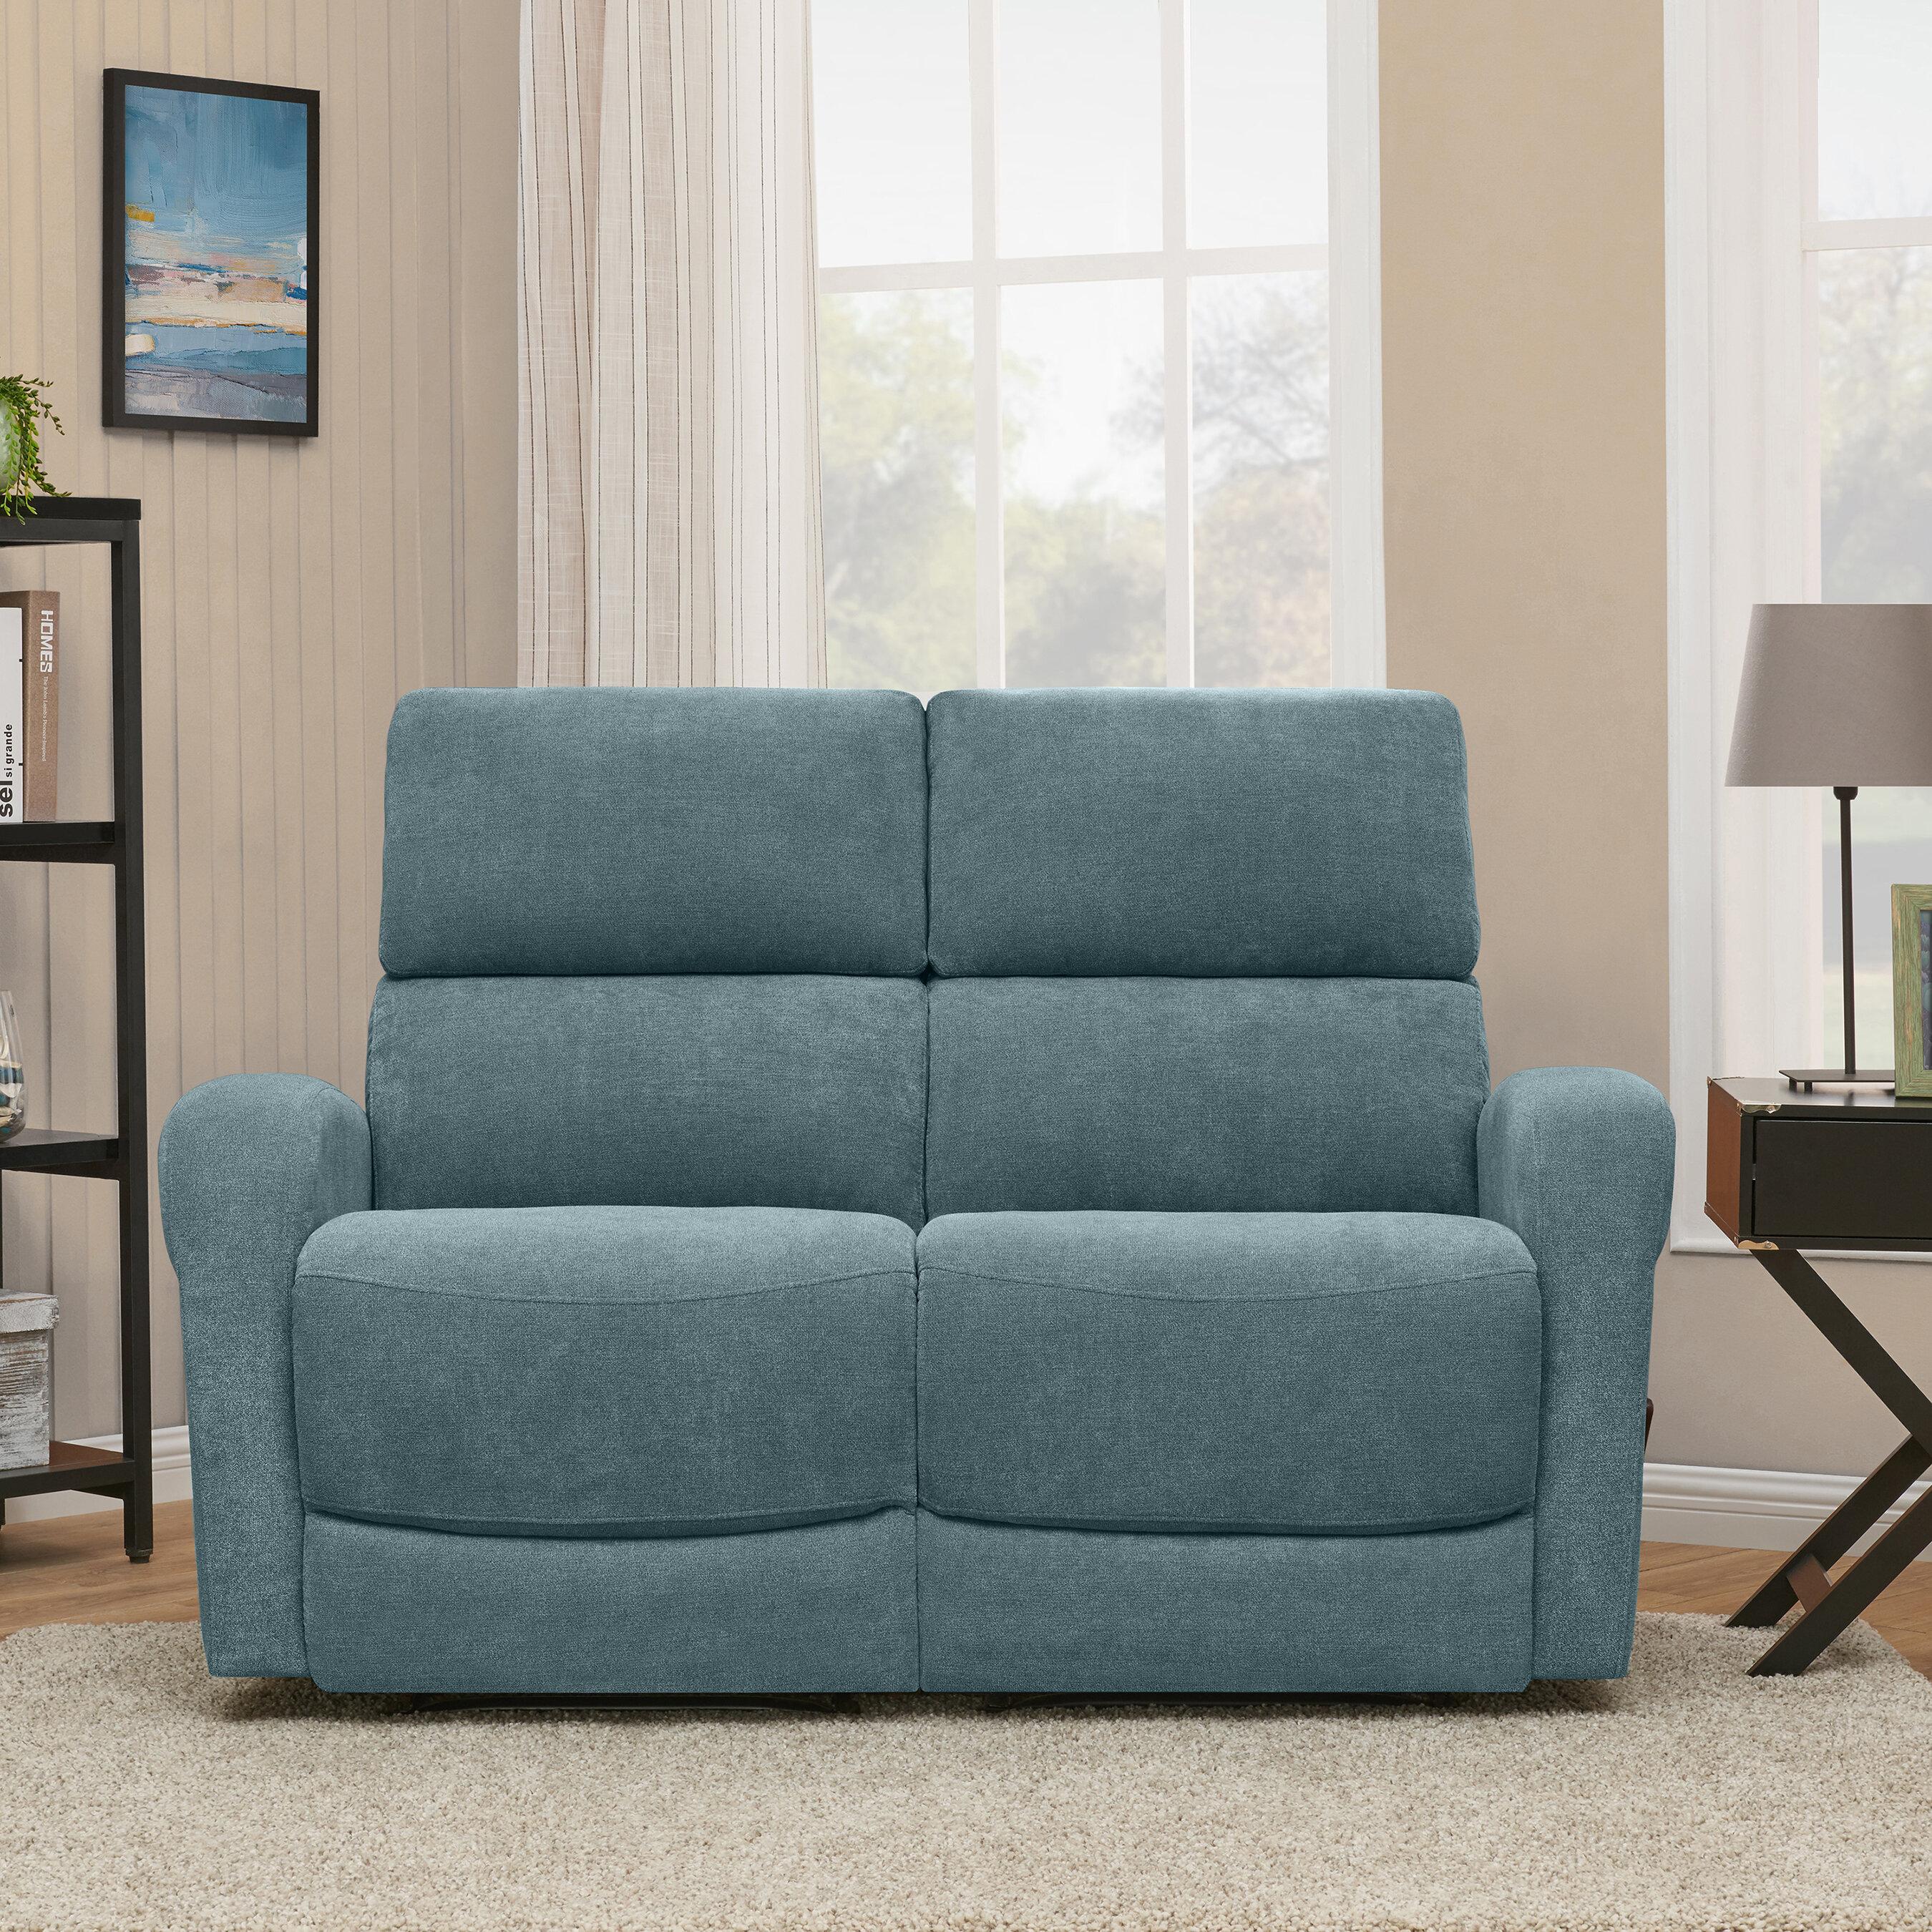 Pleasing Handy Sofa Wayfair Caraccident5 Cool Chair Designs And Ideas Caraccident5Info